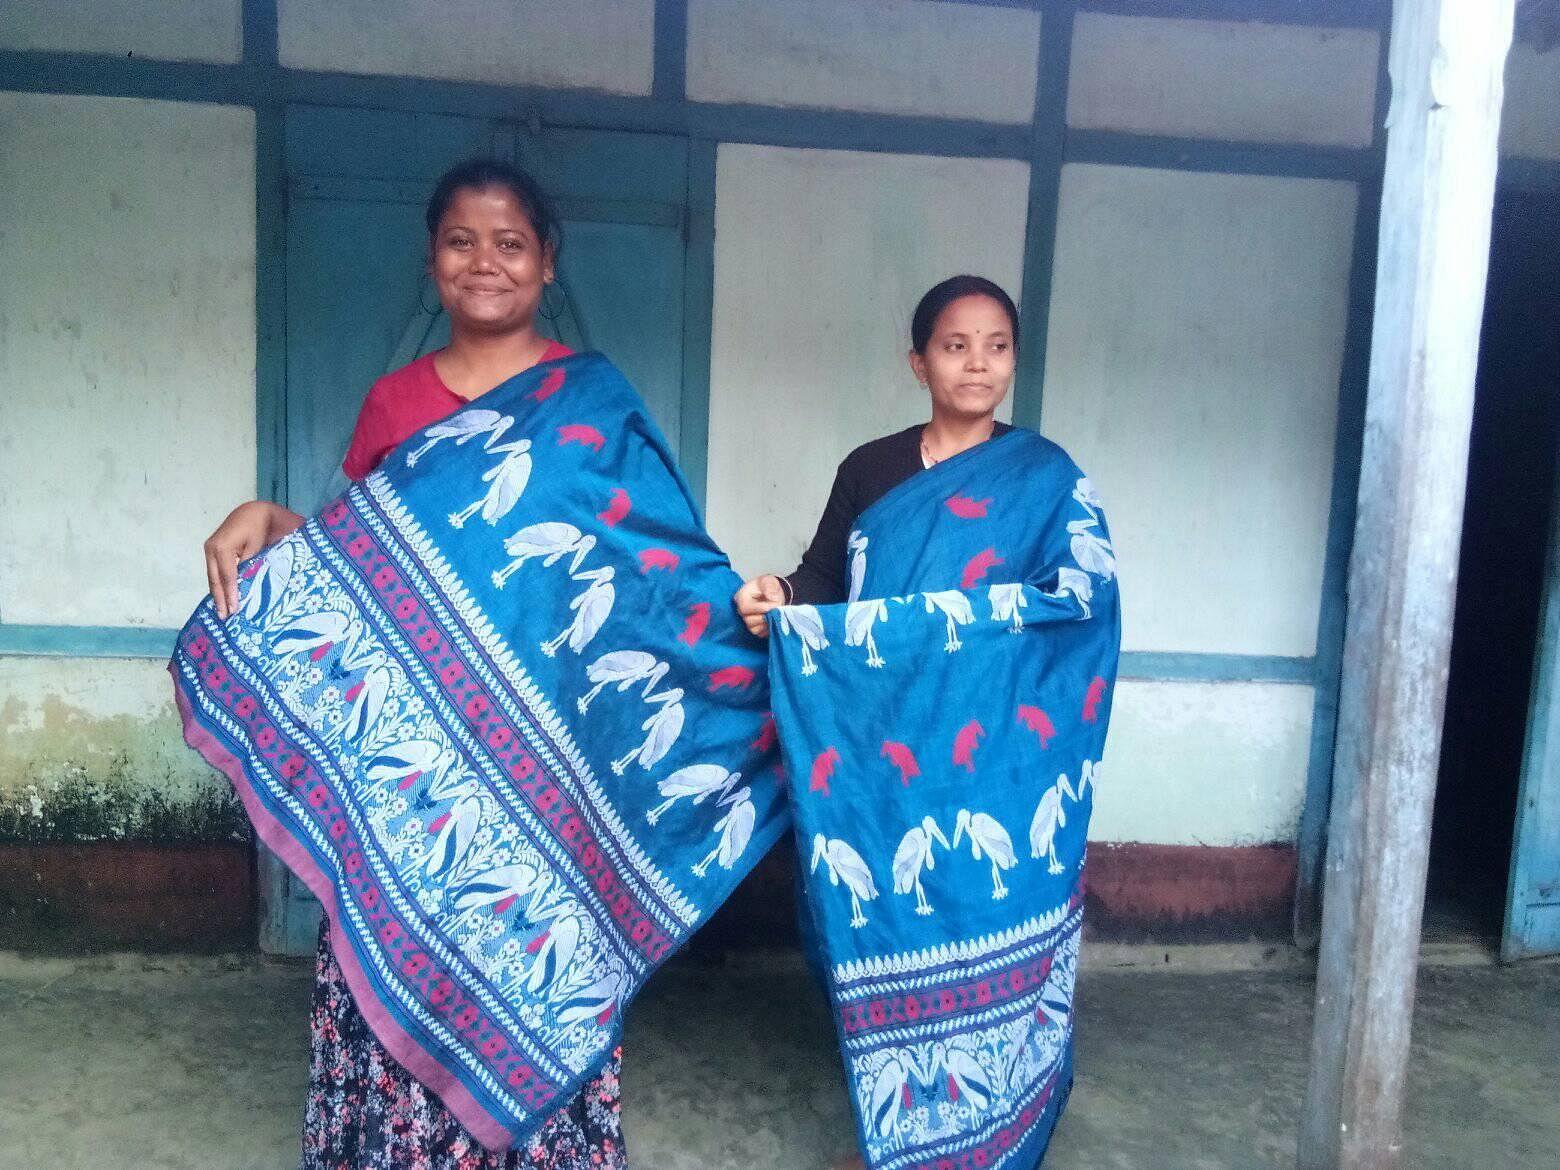 Handloom-made items featuring the Hargila motif. (Source: Facebook)